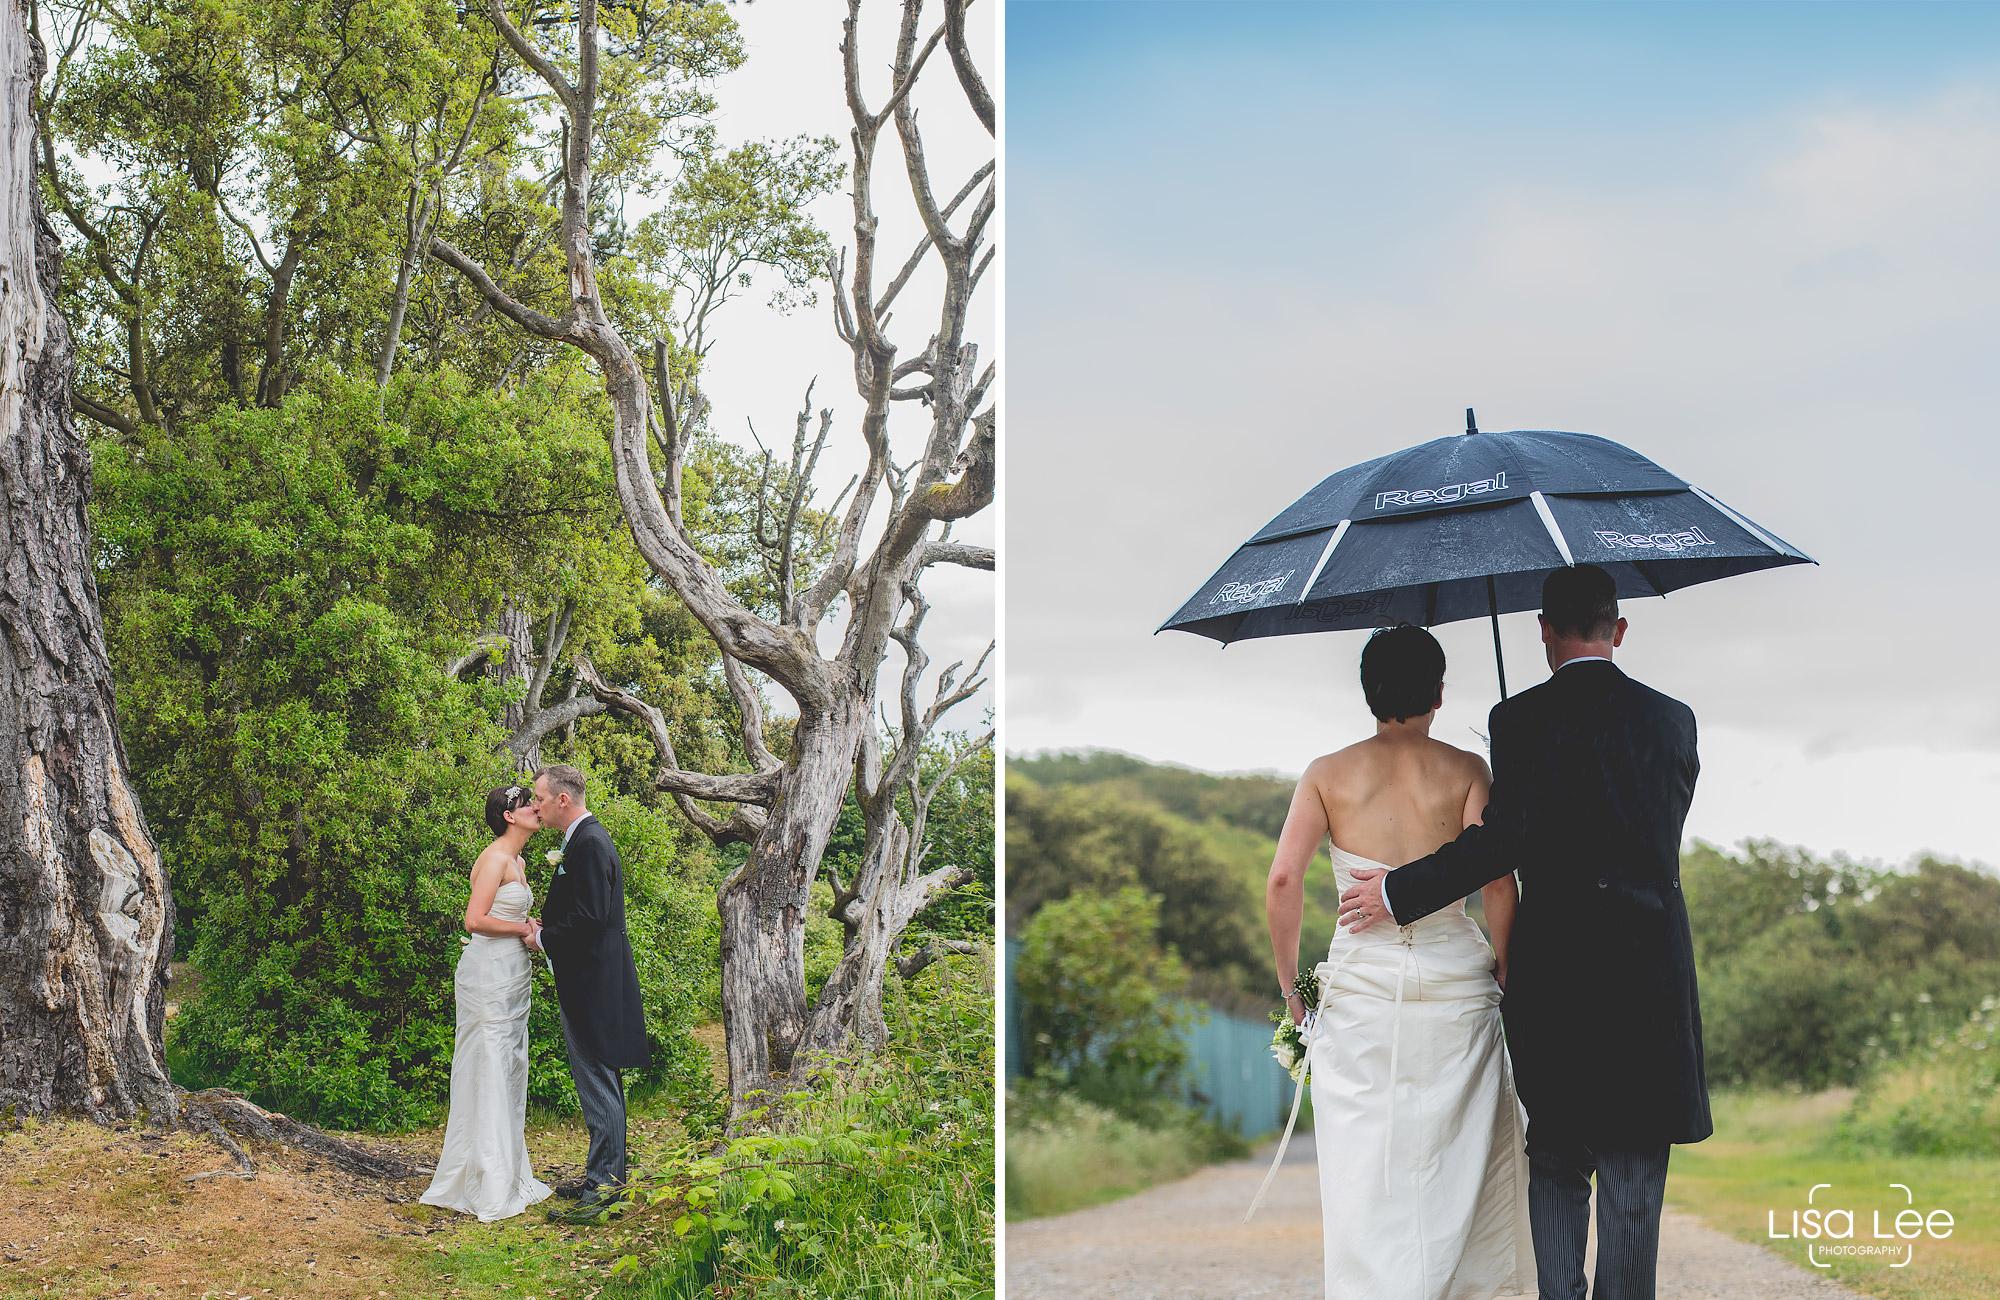 lisa-lee-wedding-photography-burton-steamerpoint3.jpg